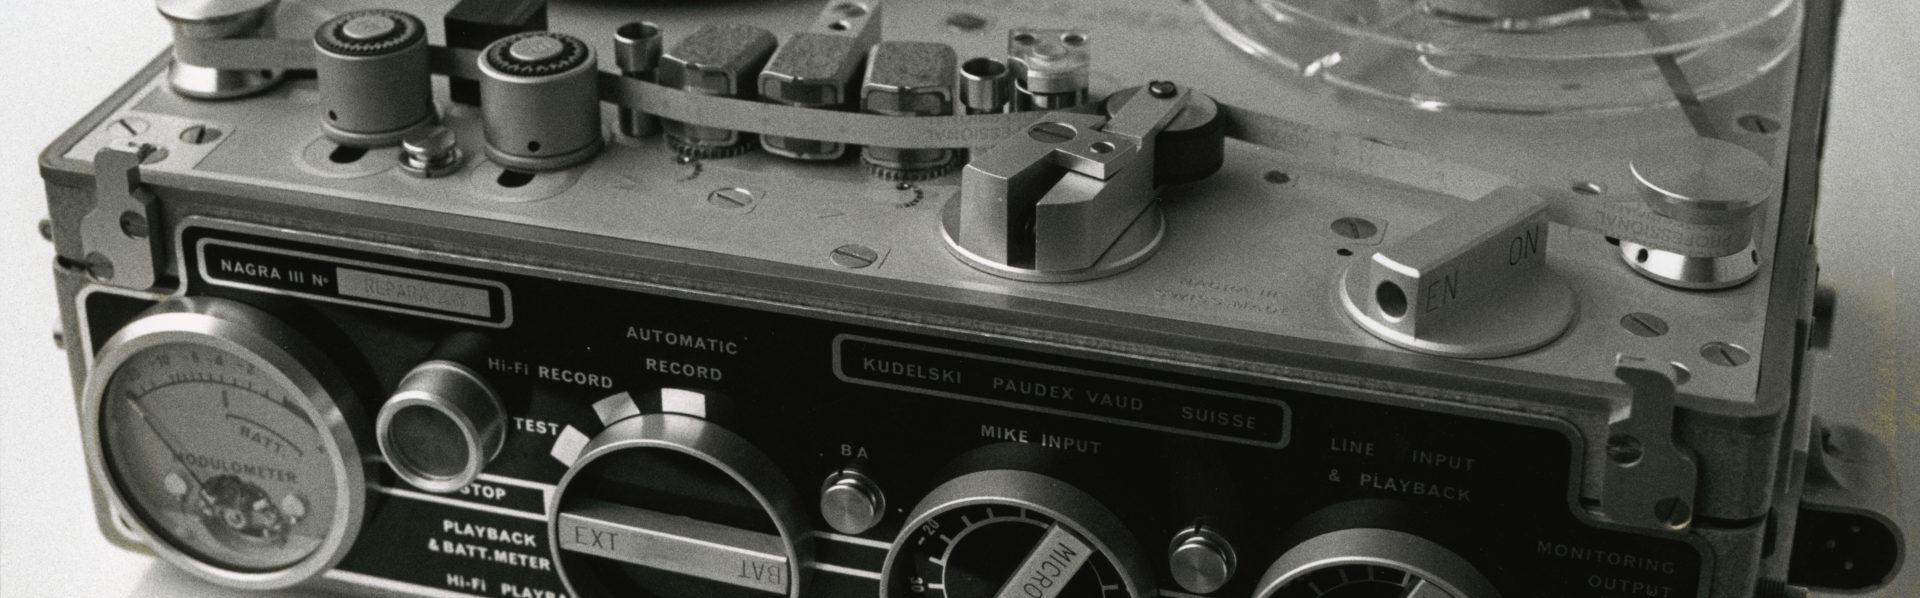 Nagra iii 1st portable recorder